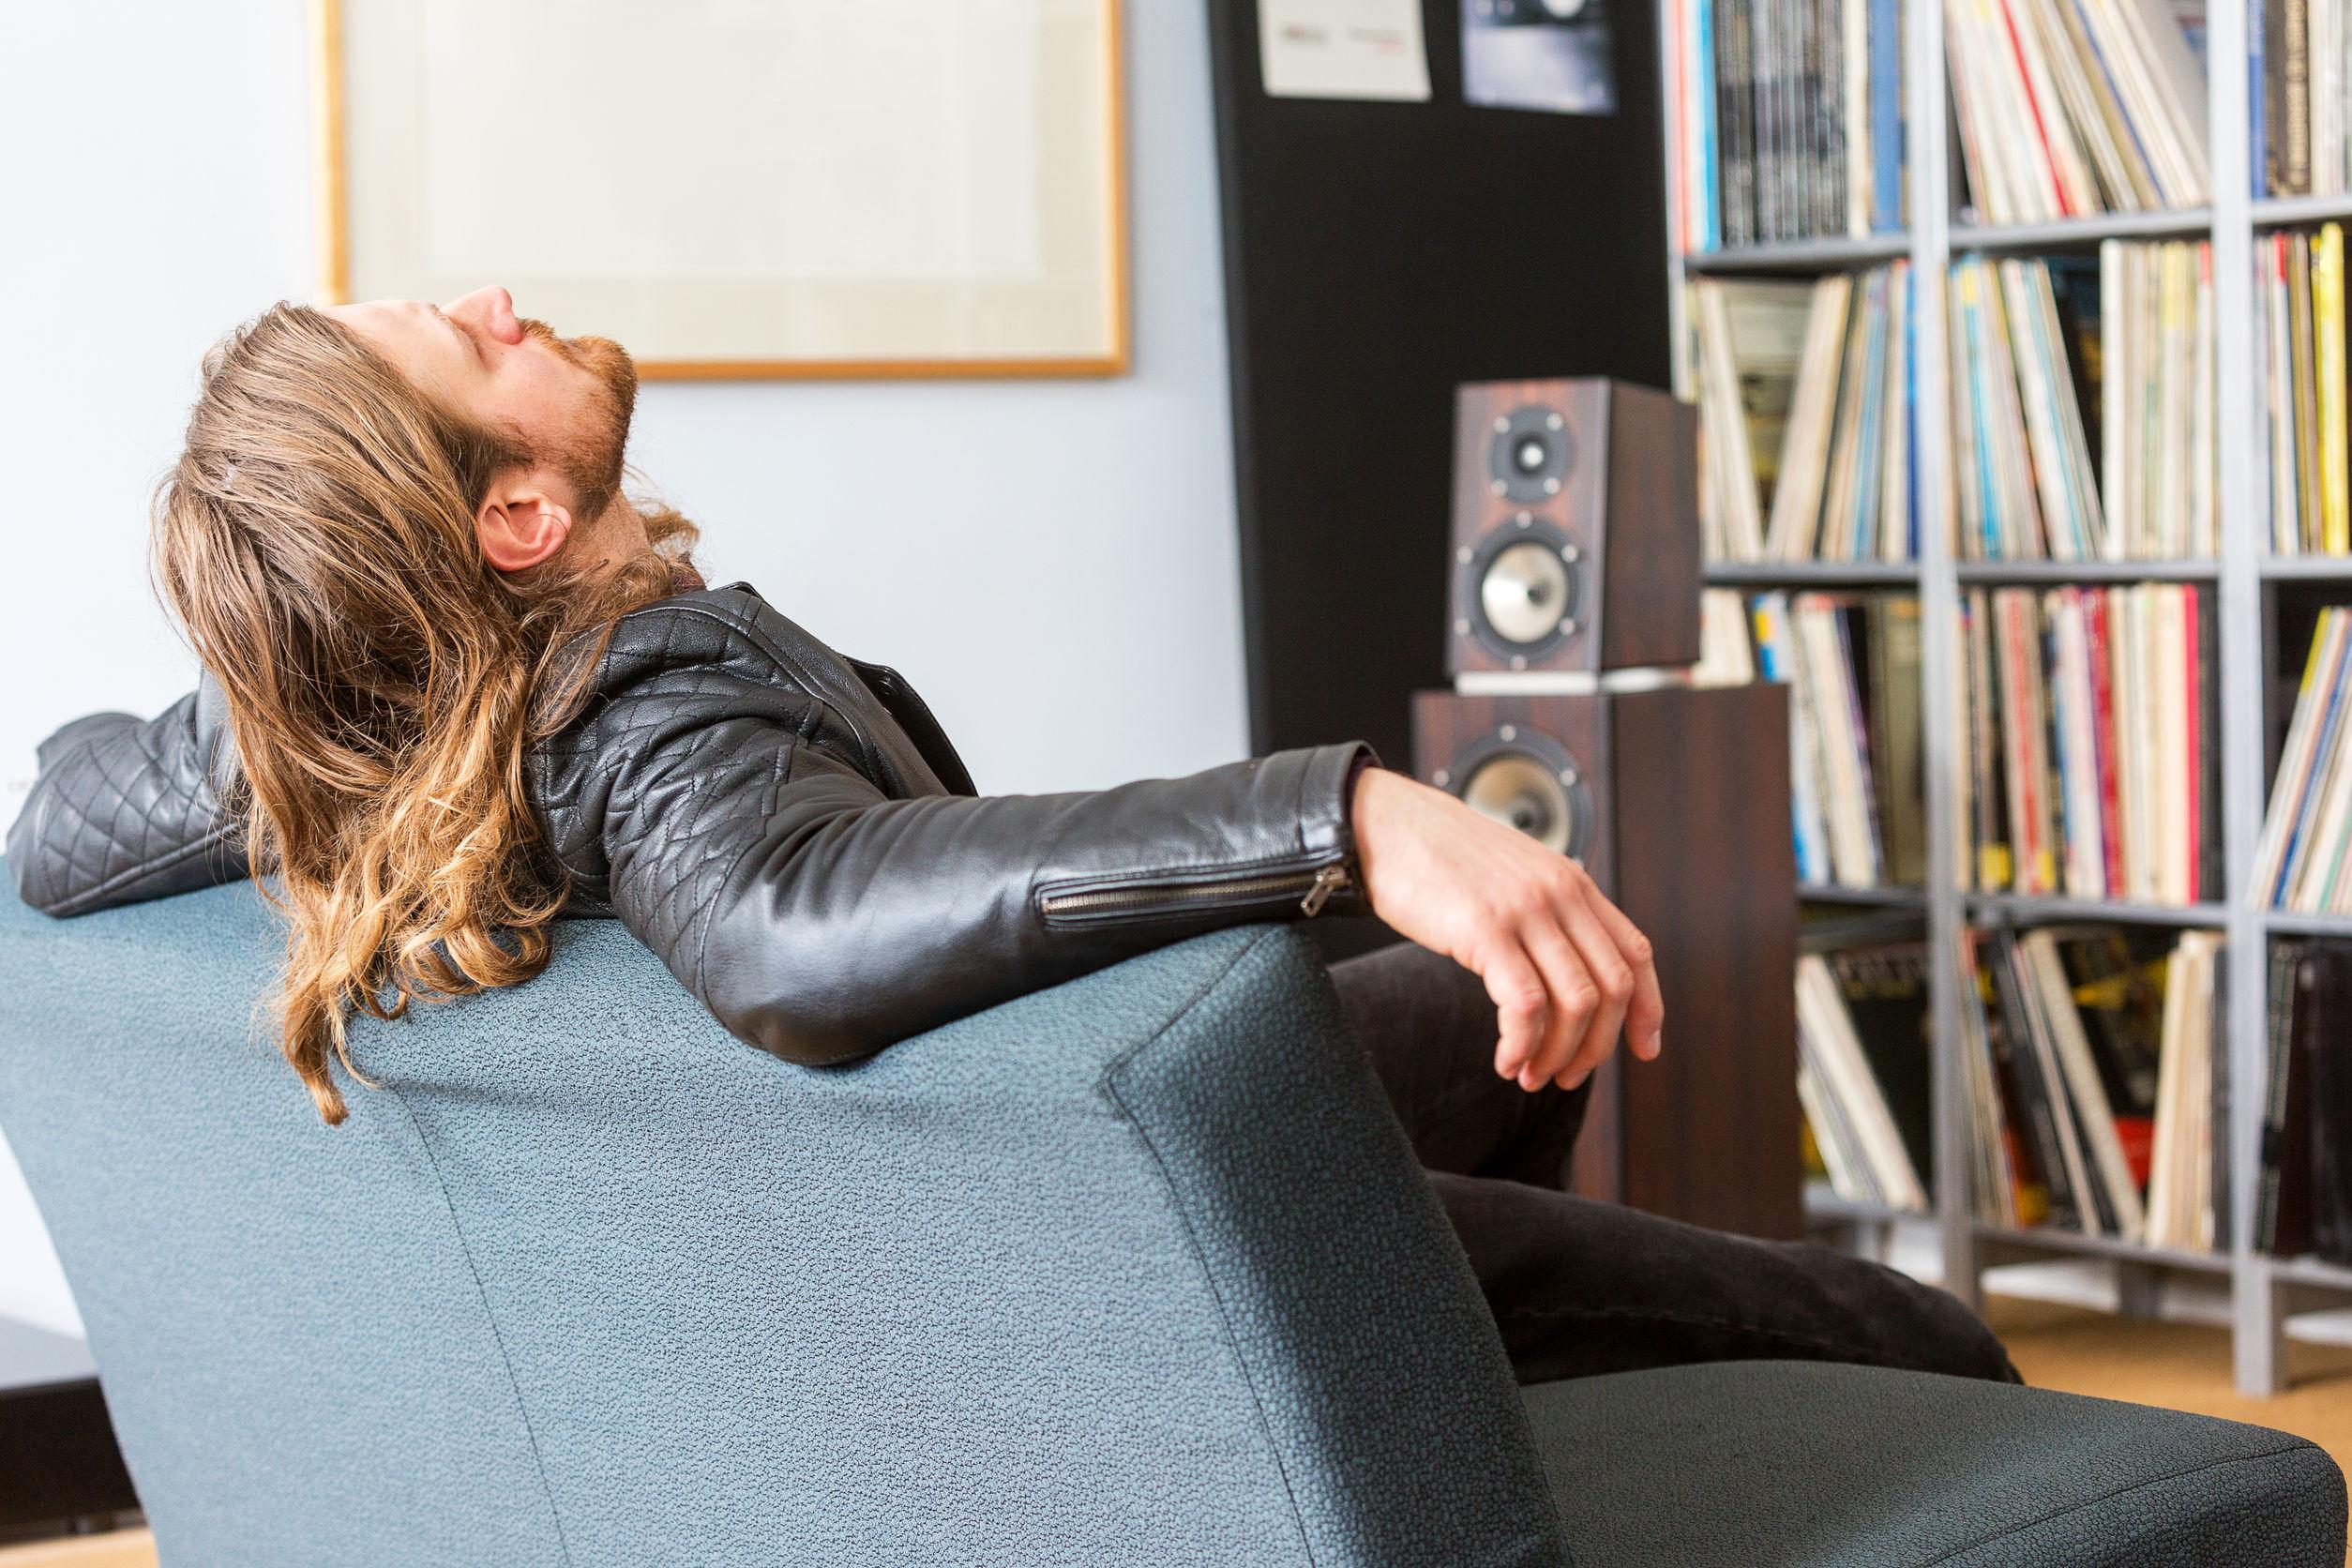 Un audiófilo recostado en un sofá escuchando música